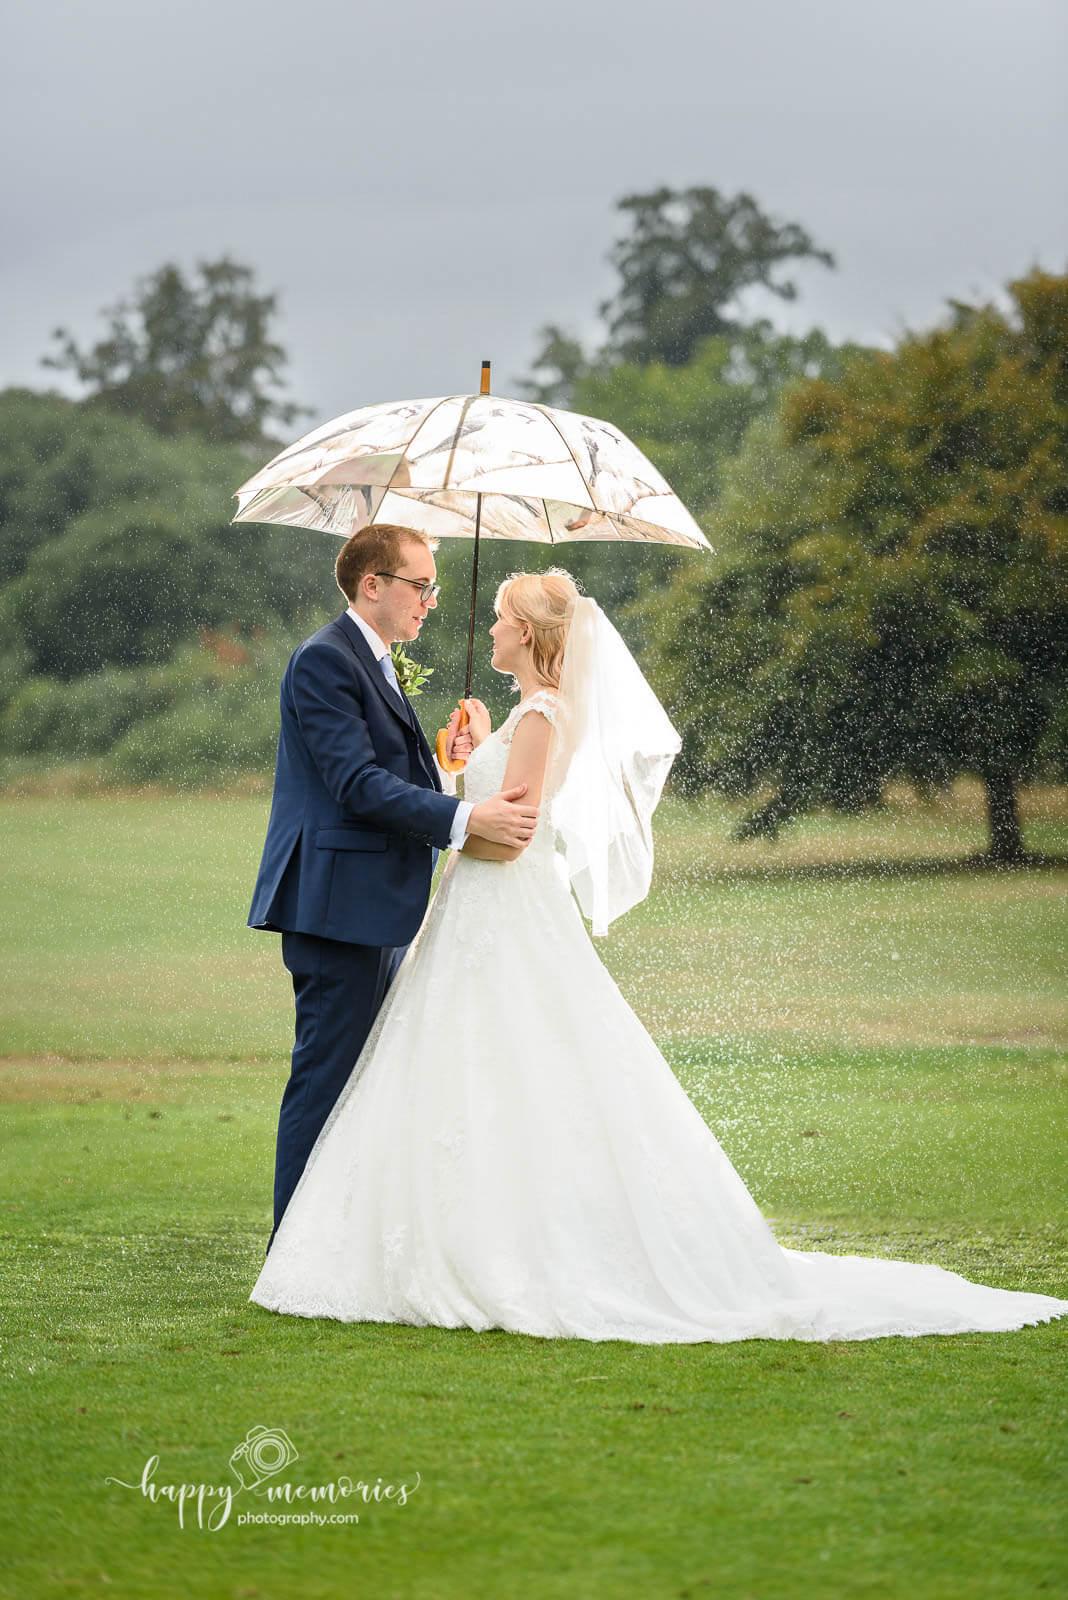 Wedding photographer East Grinstead-34